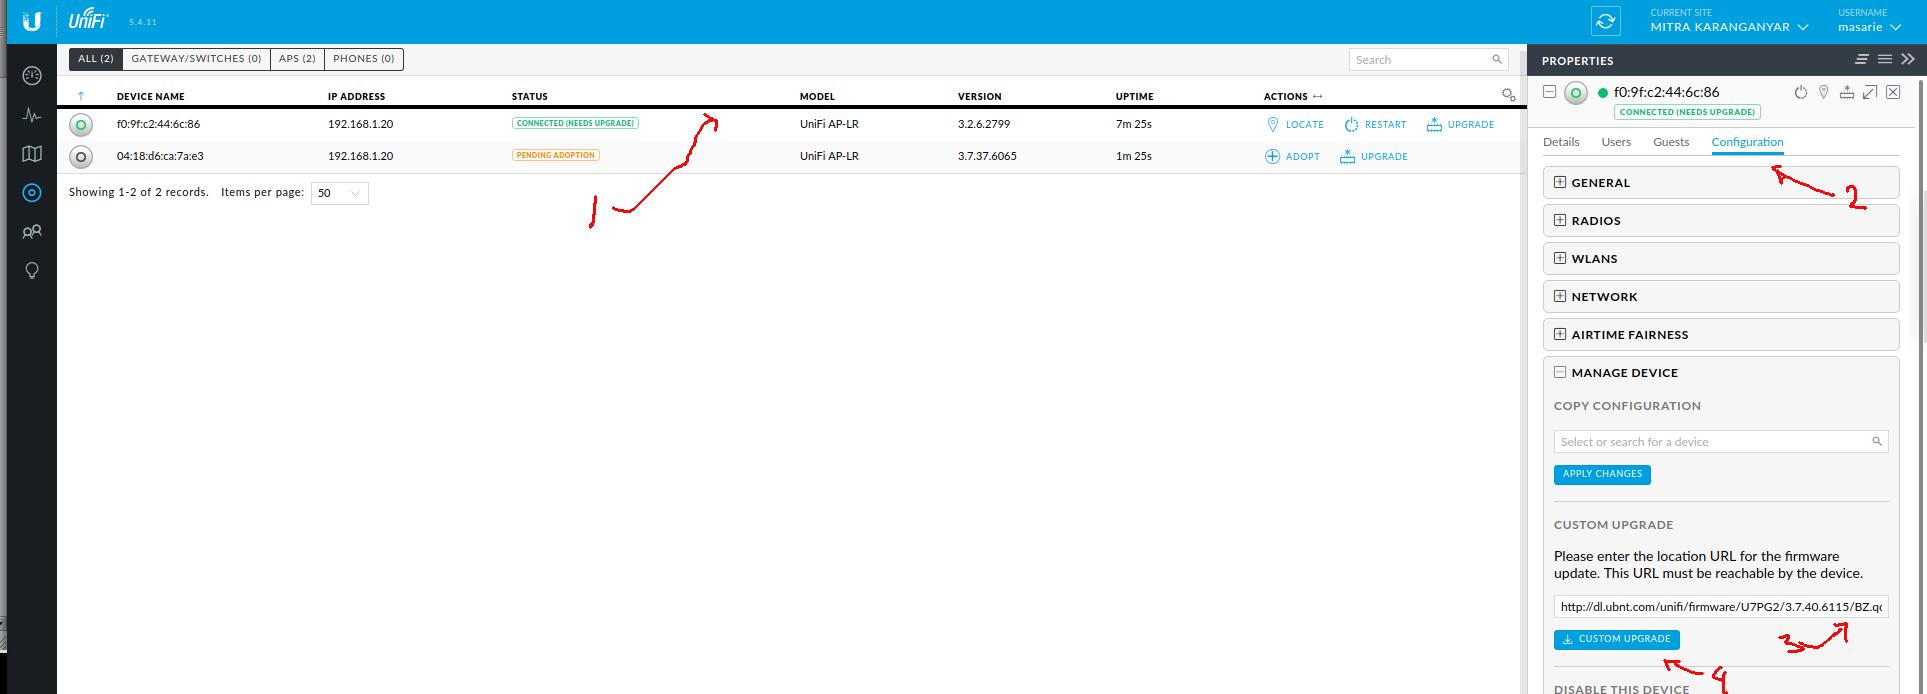 cara menggunakan custom upgrade untuk mengupgrade firmware Unifi pada unifi controller